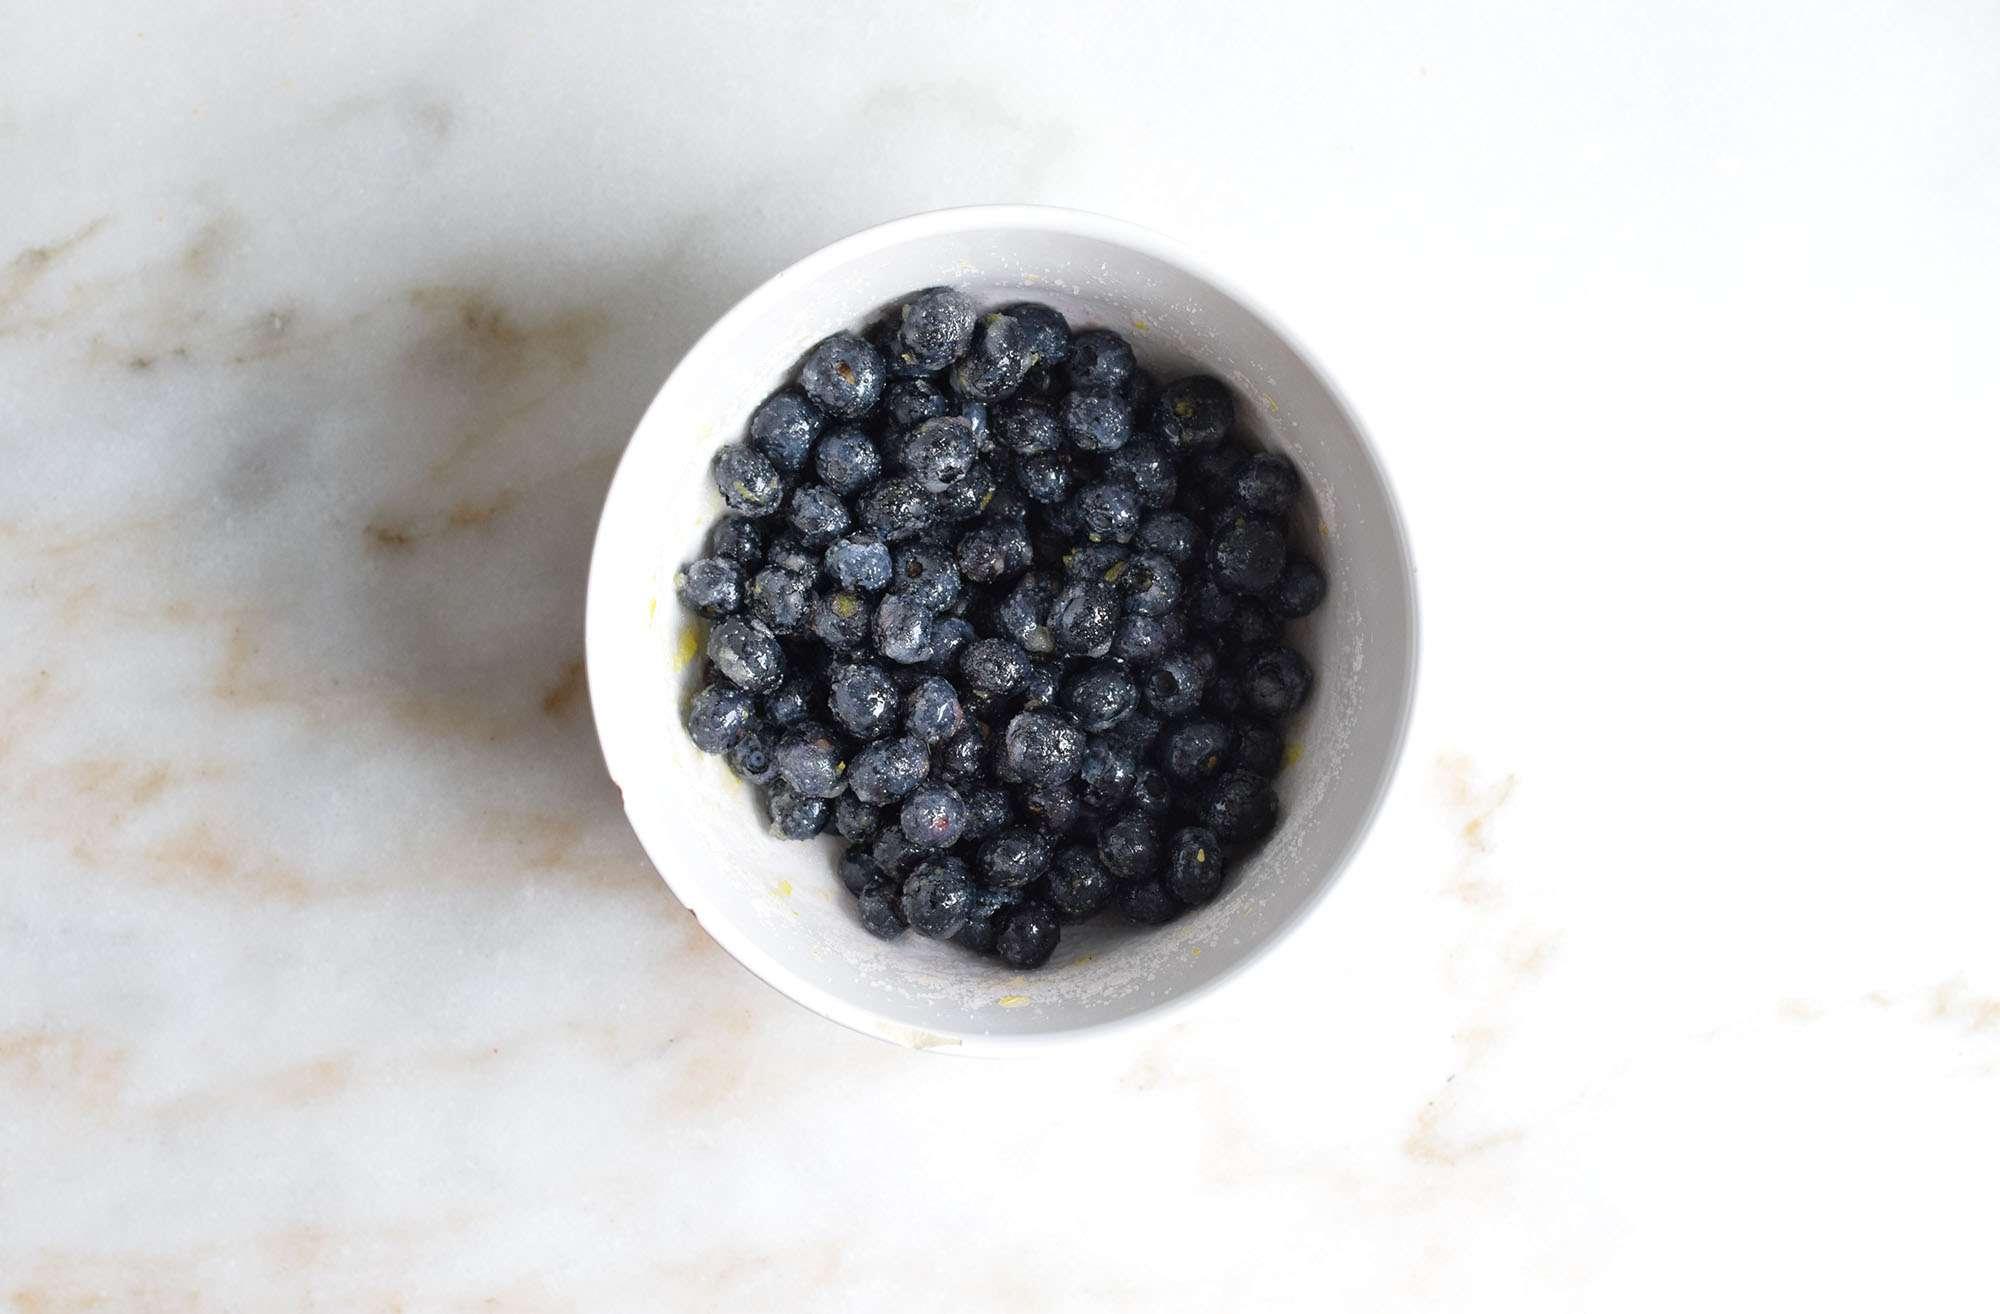 blueberries tossed with lemon zest, lemon juice, and sugar